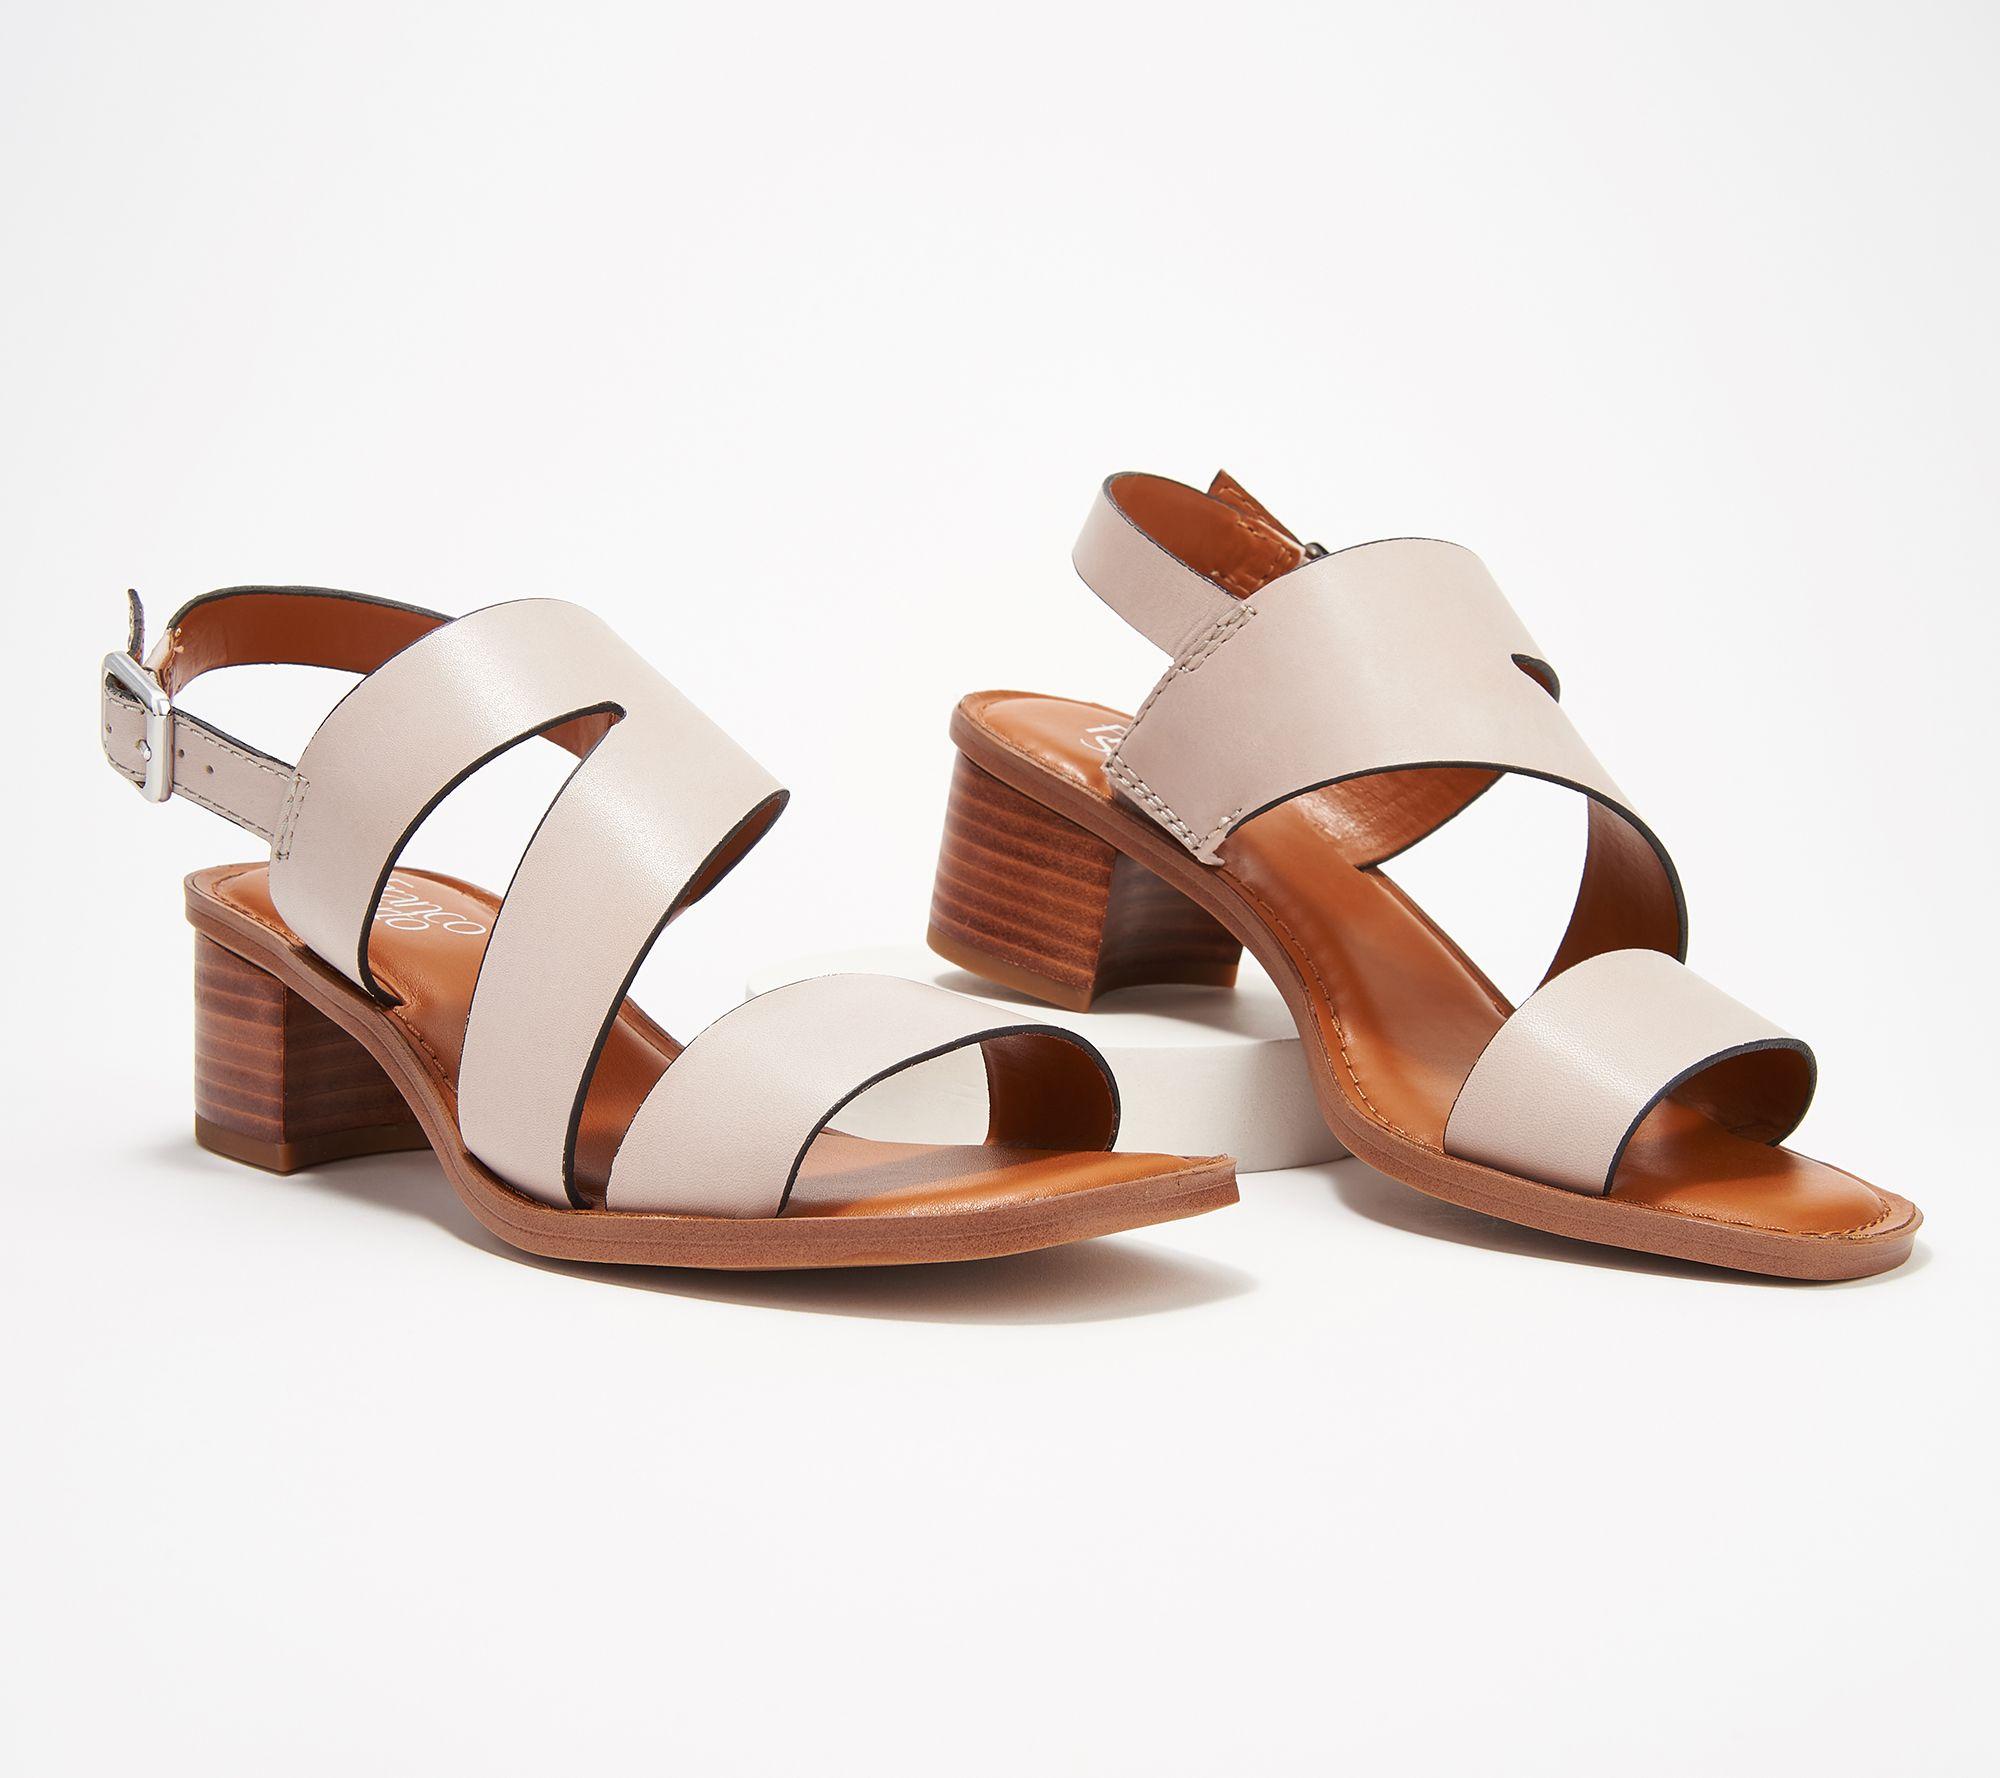 1a7c72d5ff9 Franco Sarto Leather Heeled Sandals w  Asymmetrical Strap - Lilah - Page 1  — QVC.com